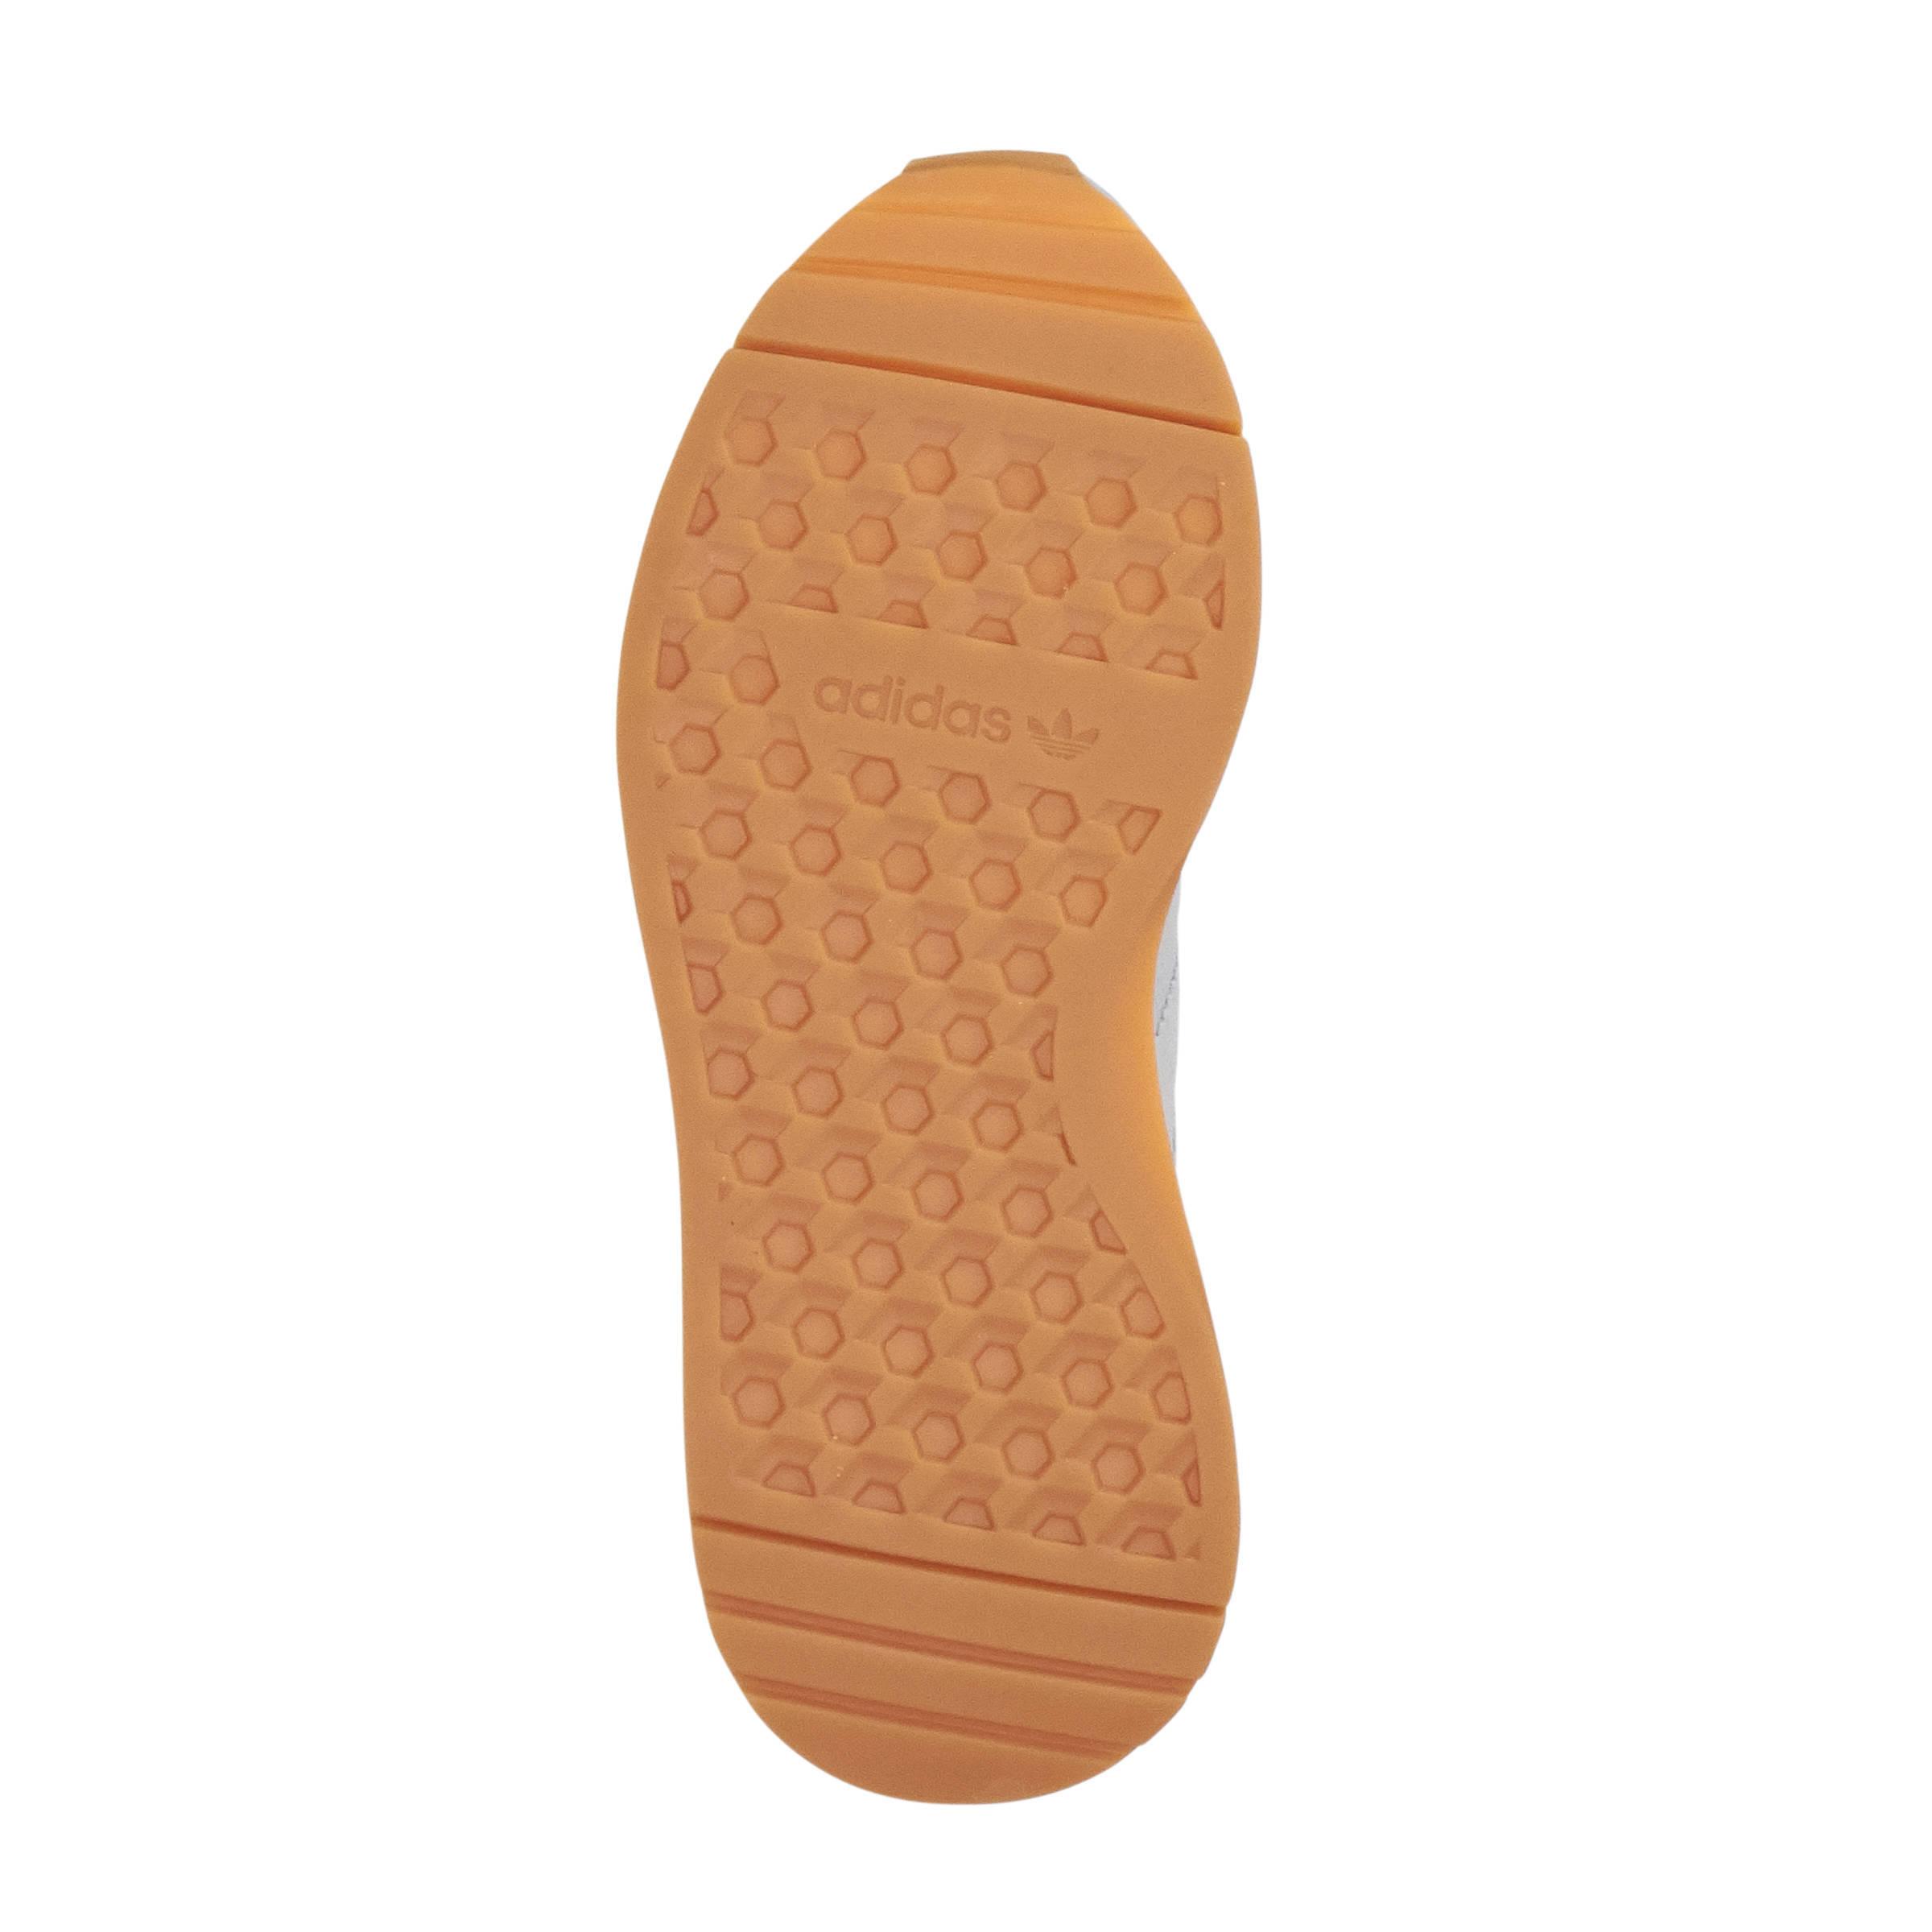 new style dbca2 43fac Originals Td6tpw Sneakers Adidas N 5923 Wehkamp qqPSa